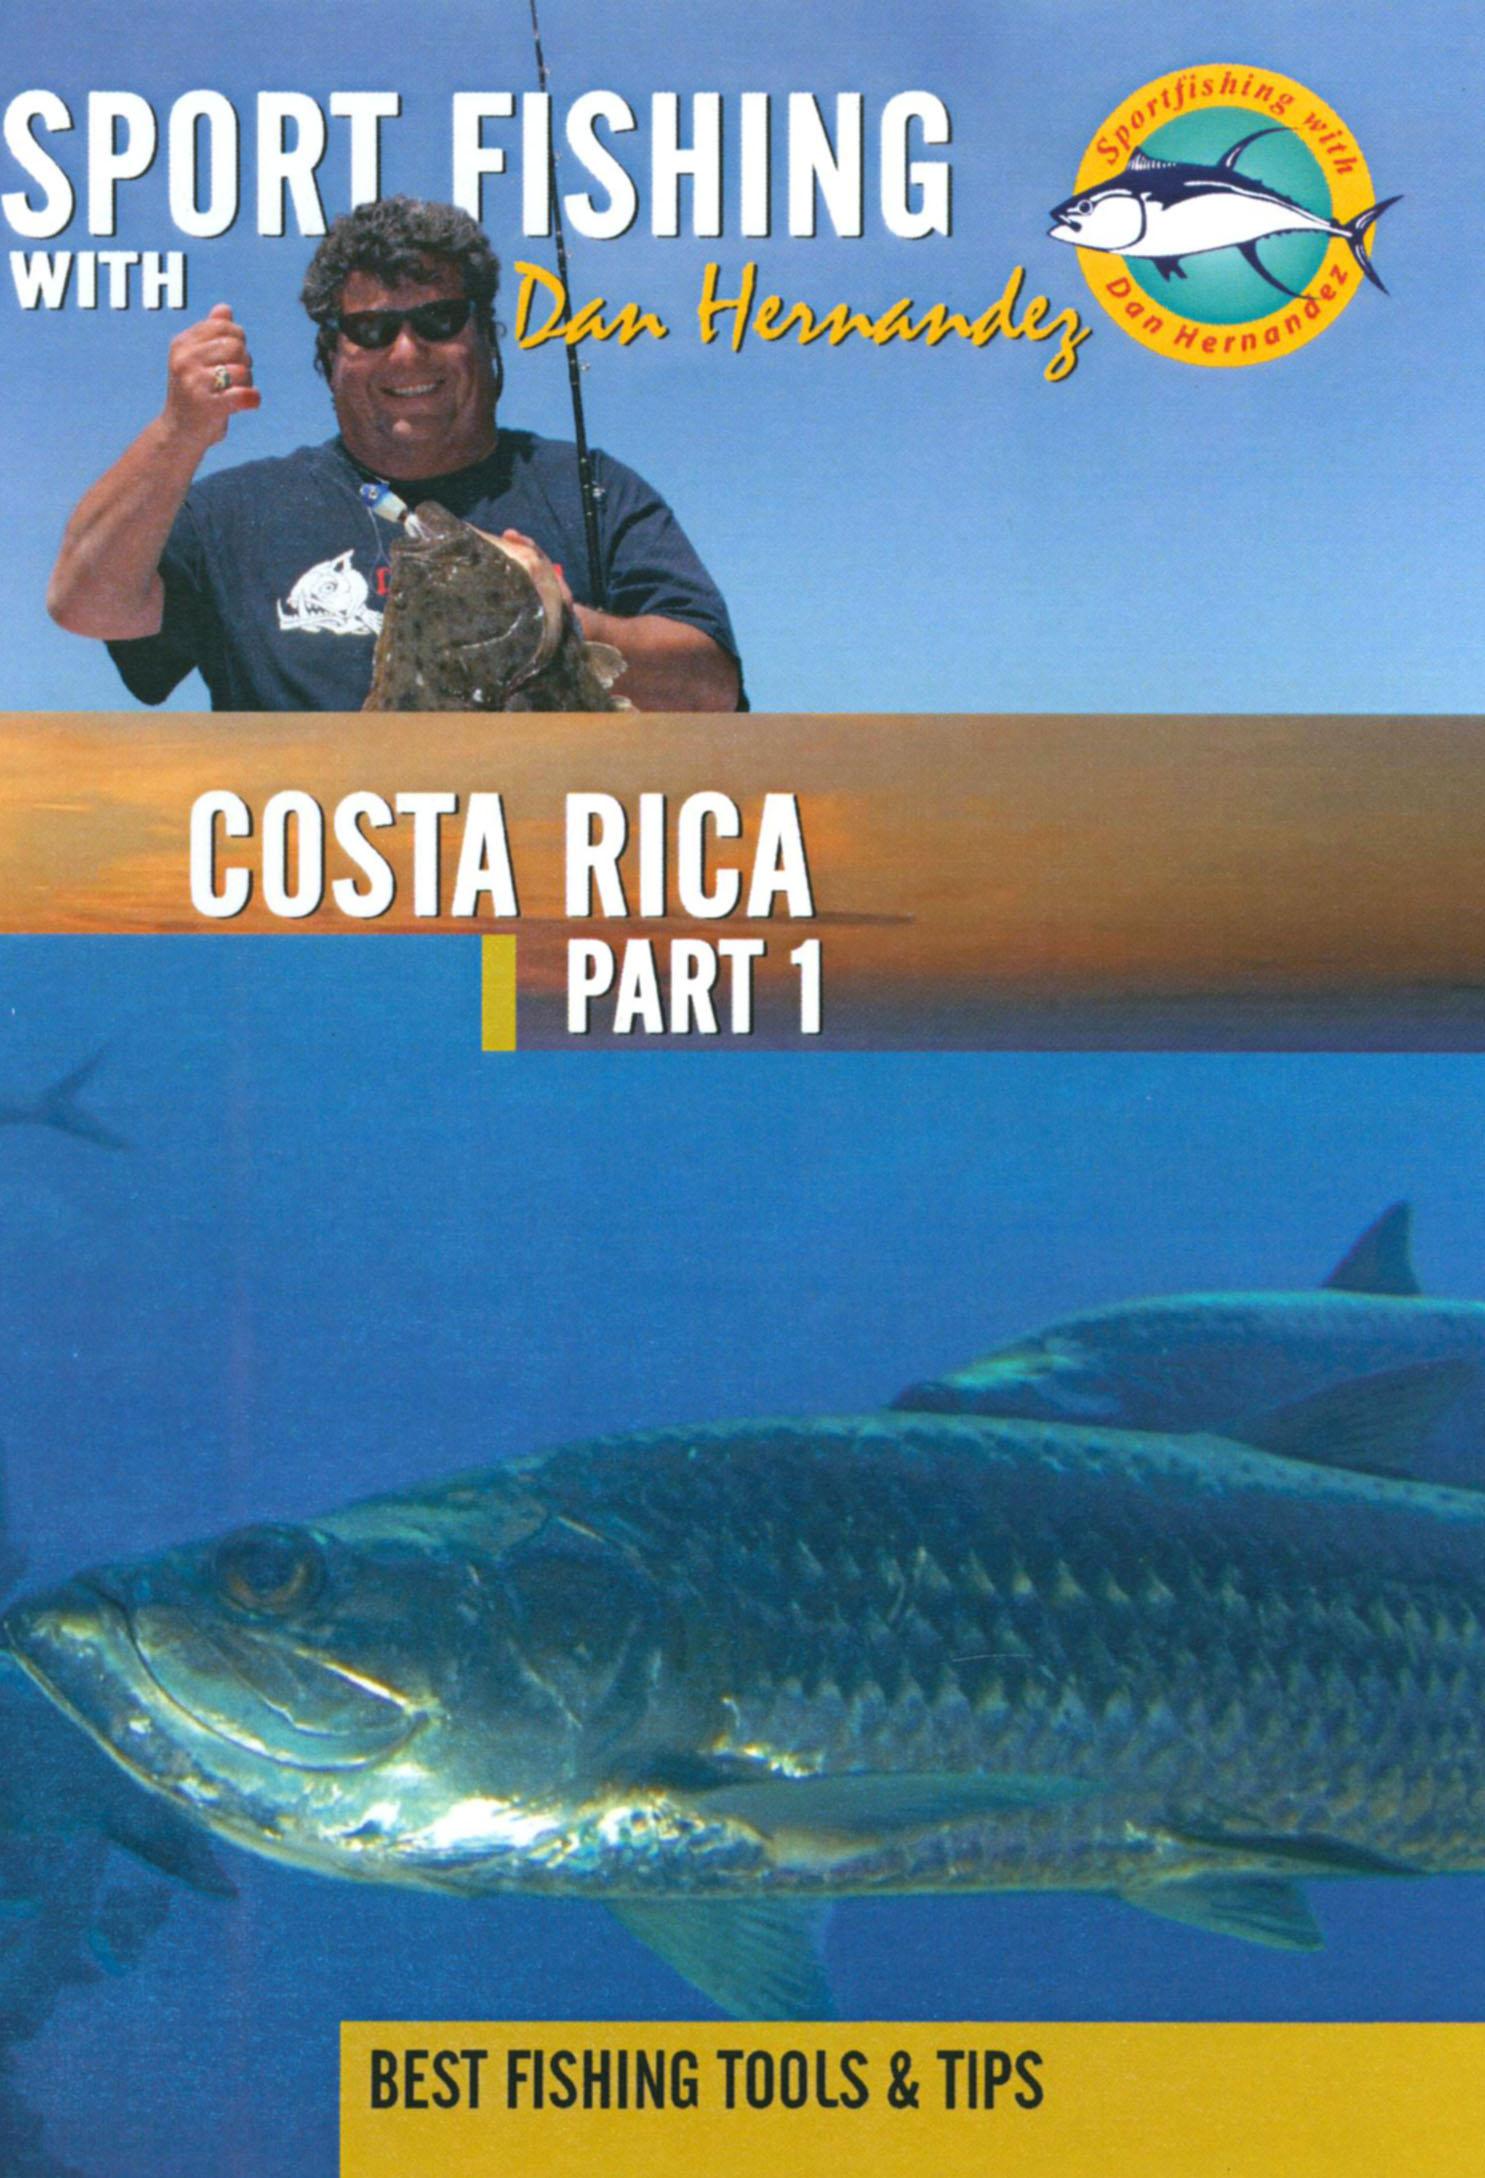 Sport Fishing With Dan Hernandez: Costa Rica, Part 1